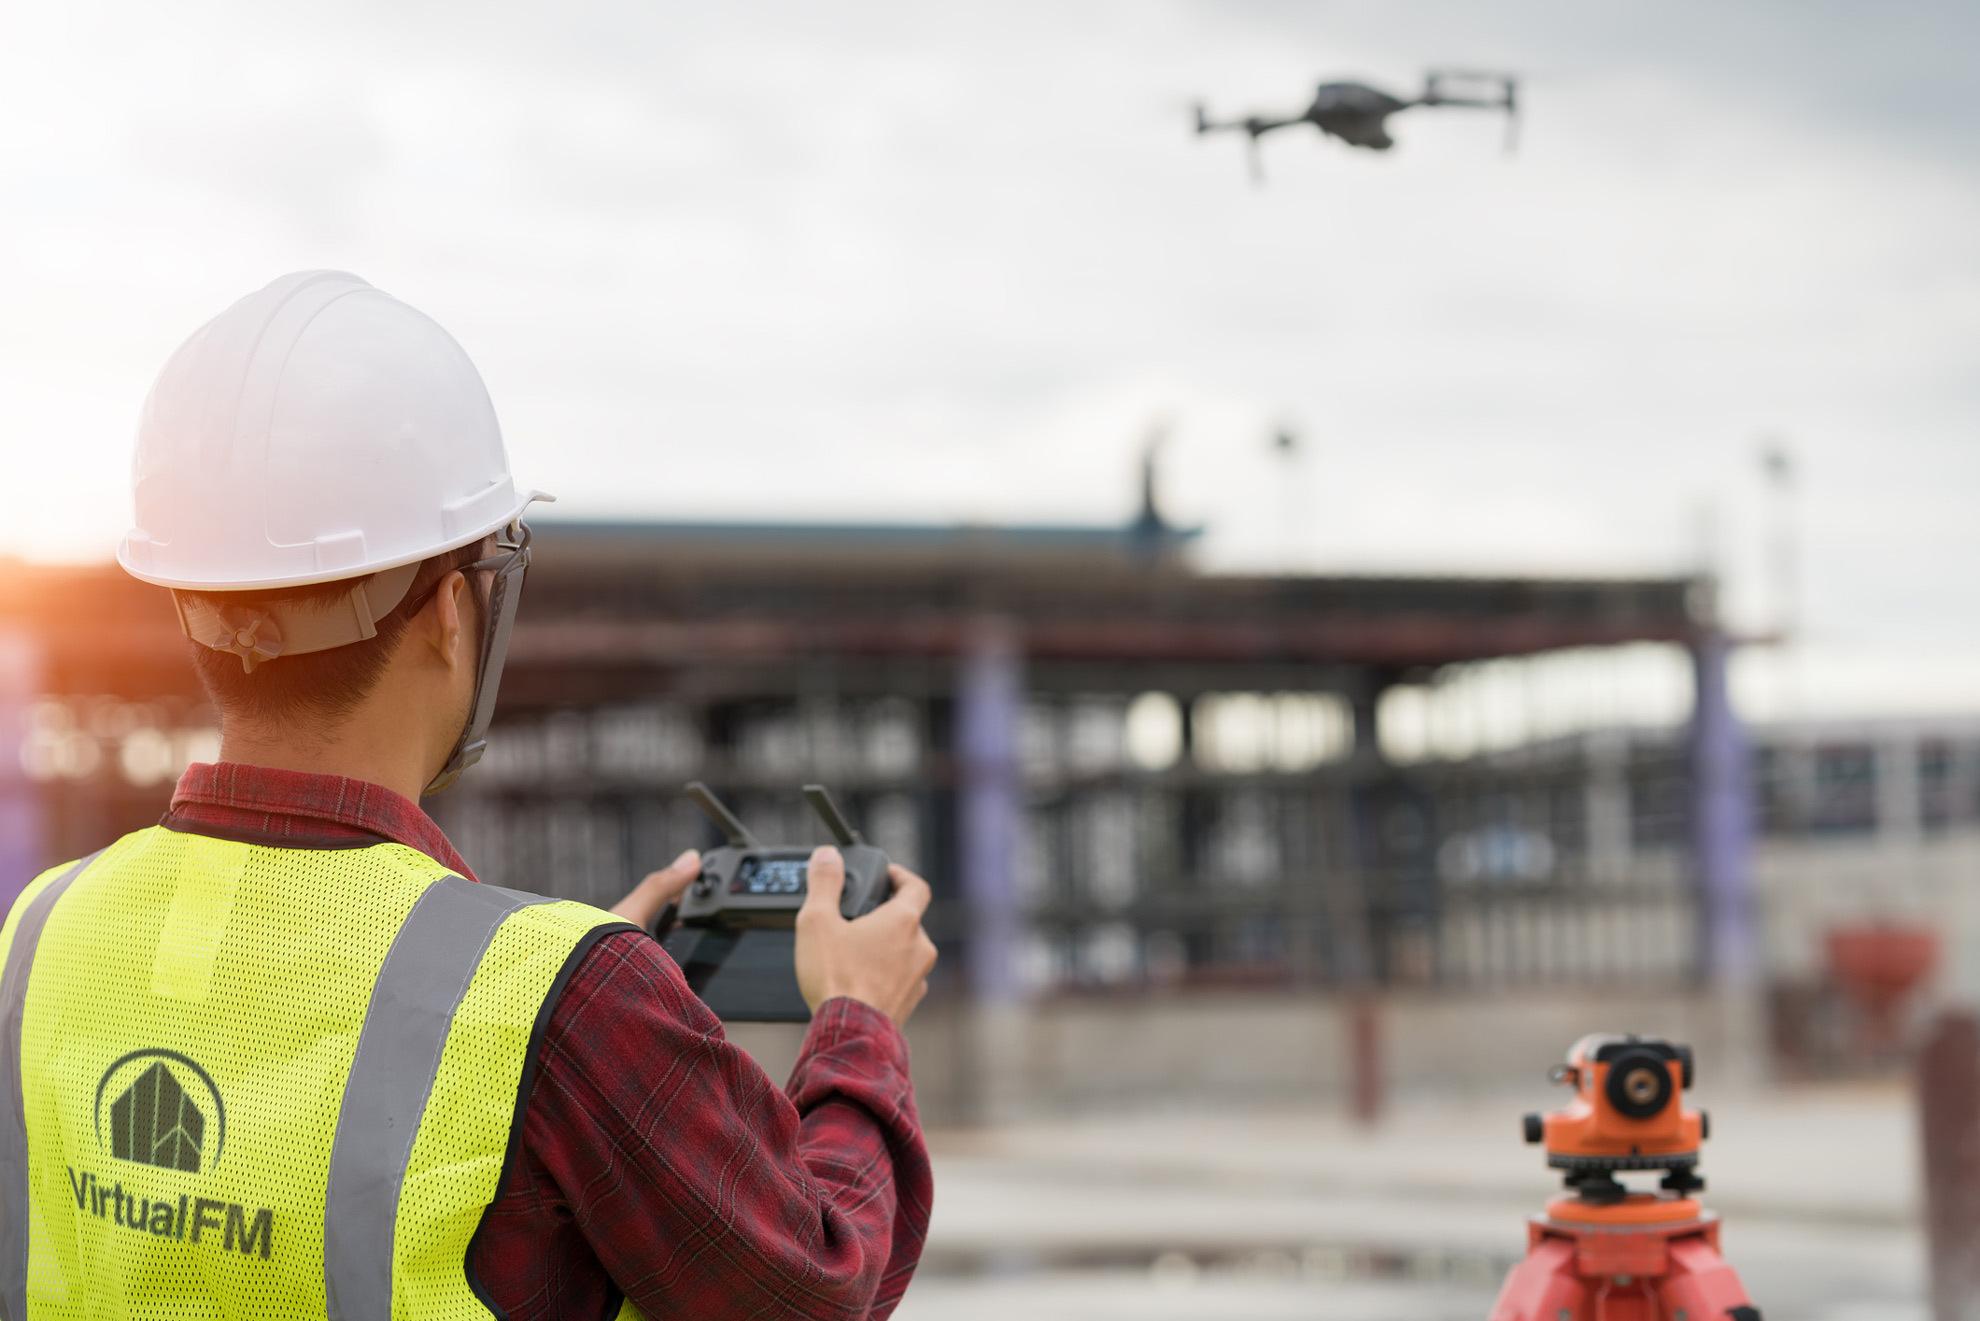 virtual-fm-aerial-drone-service-facilities-management-2-2